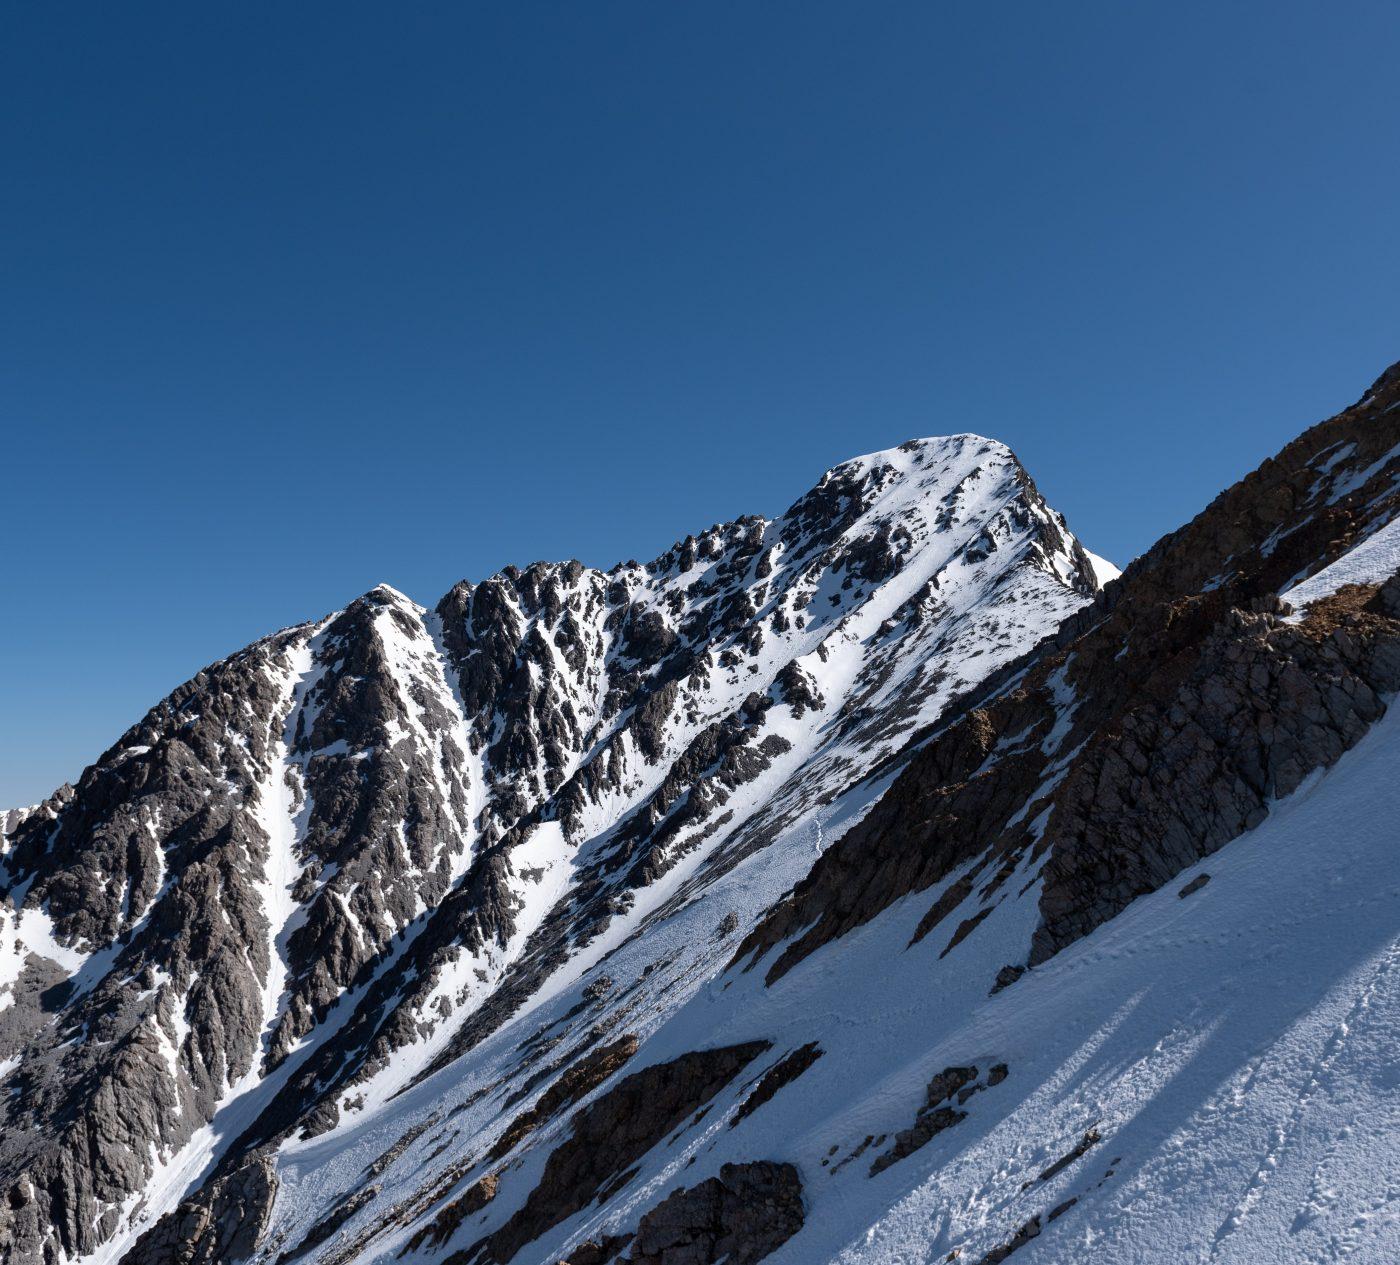 Borah peak america's best mountain climbs